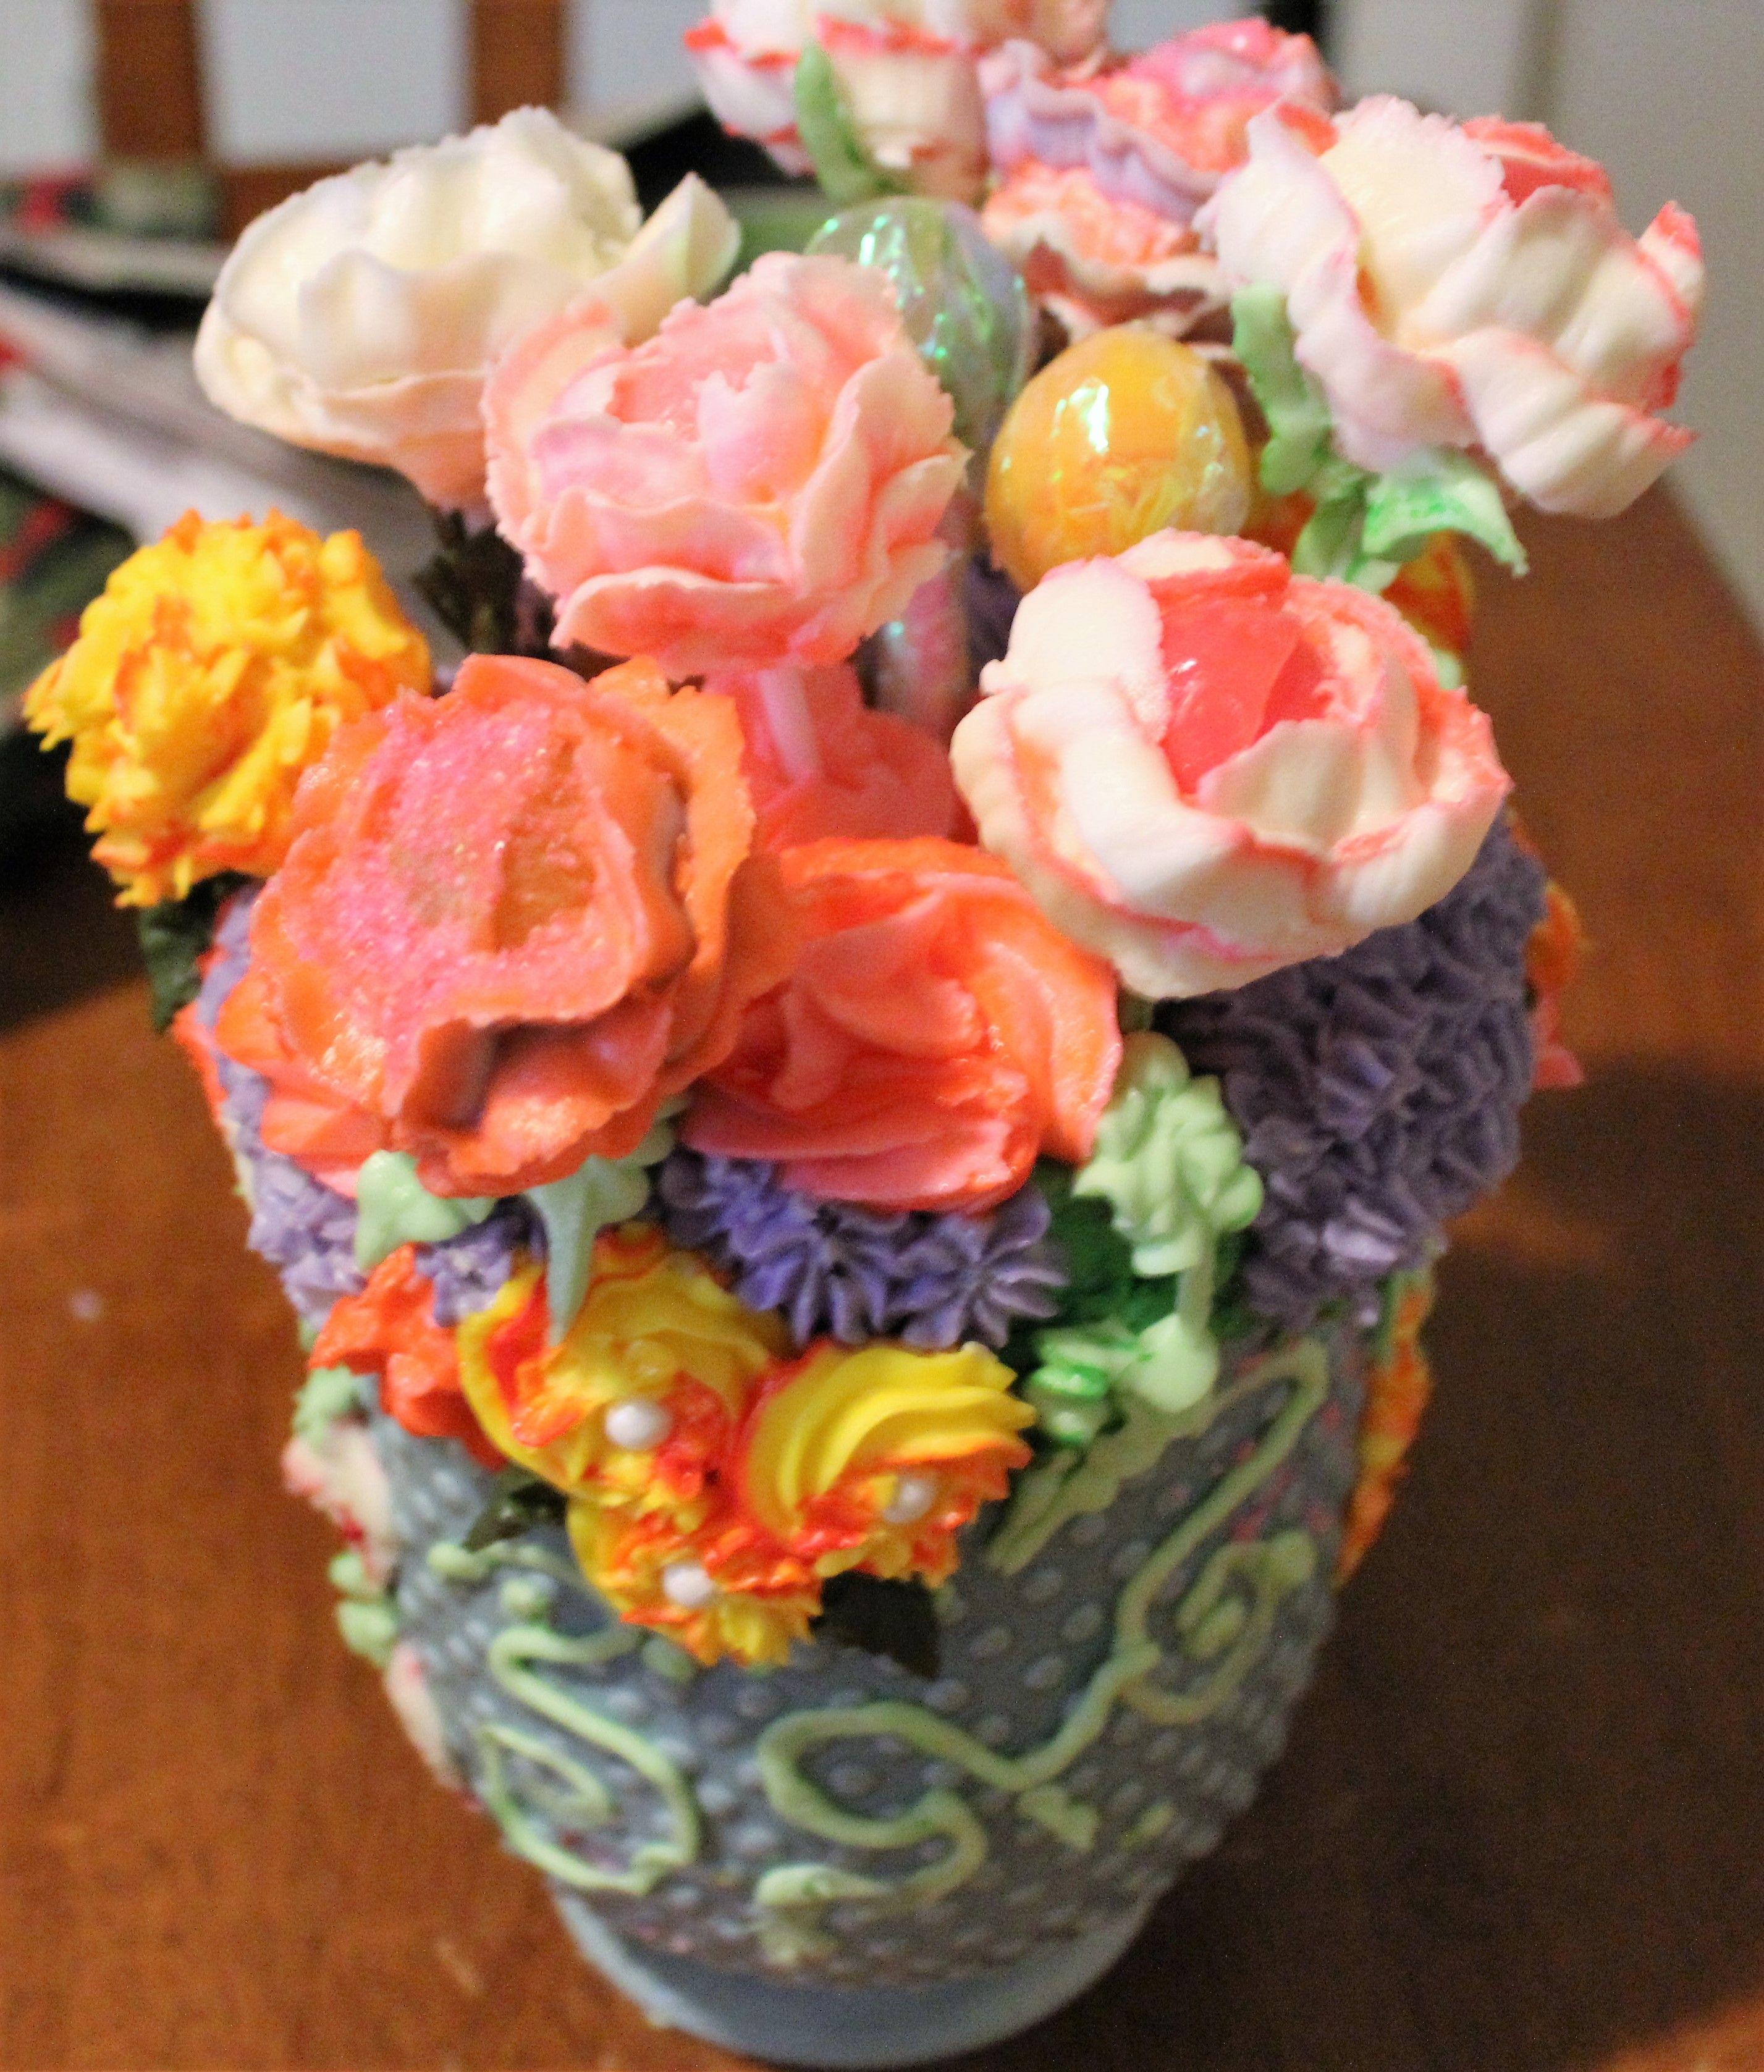 Cake in a Flower Pot.